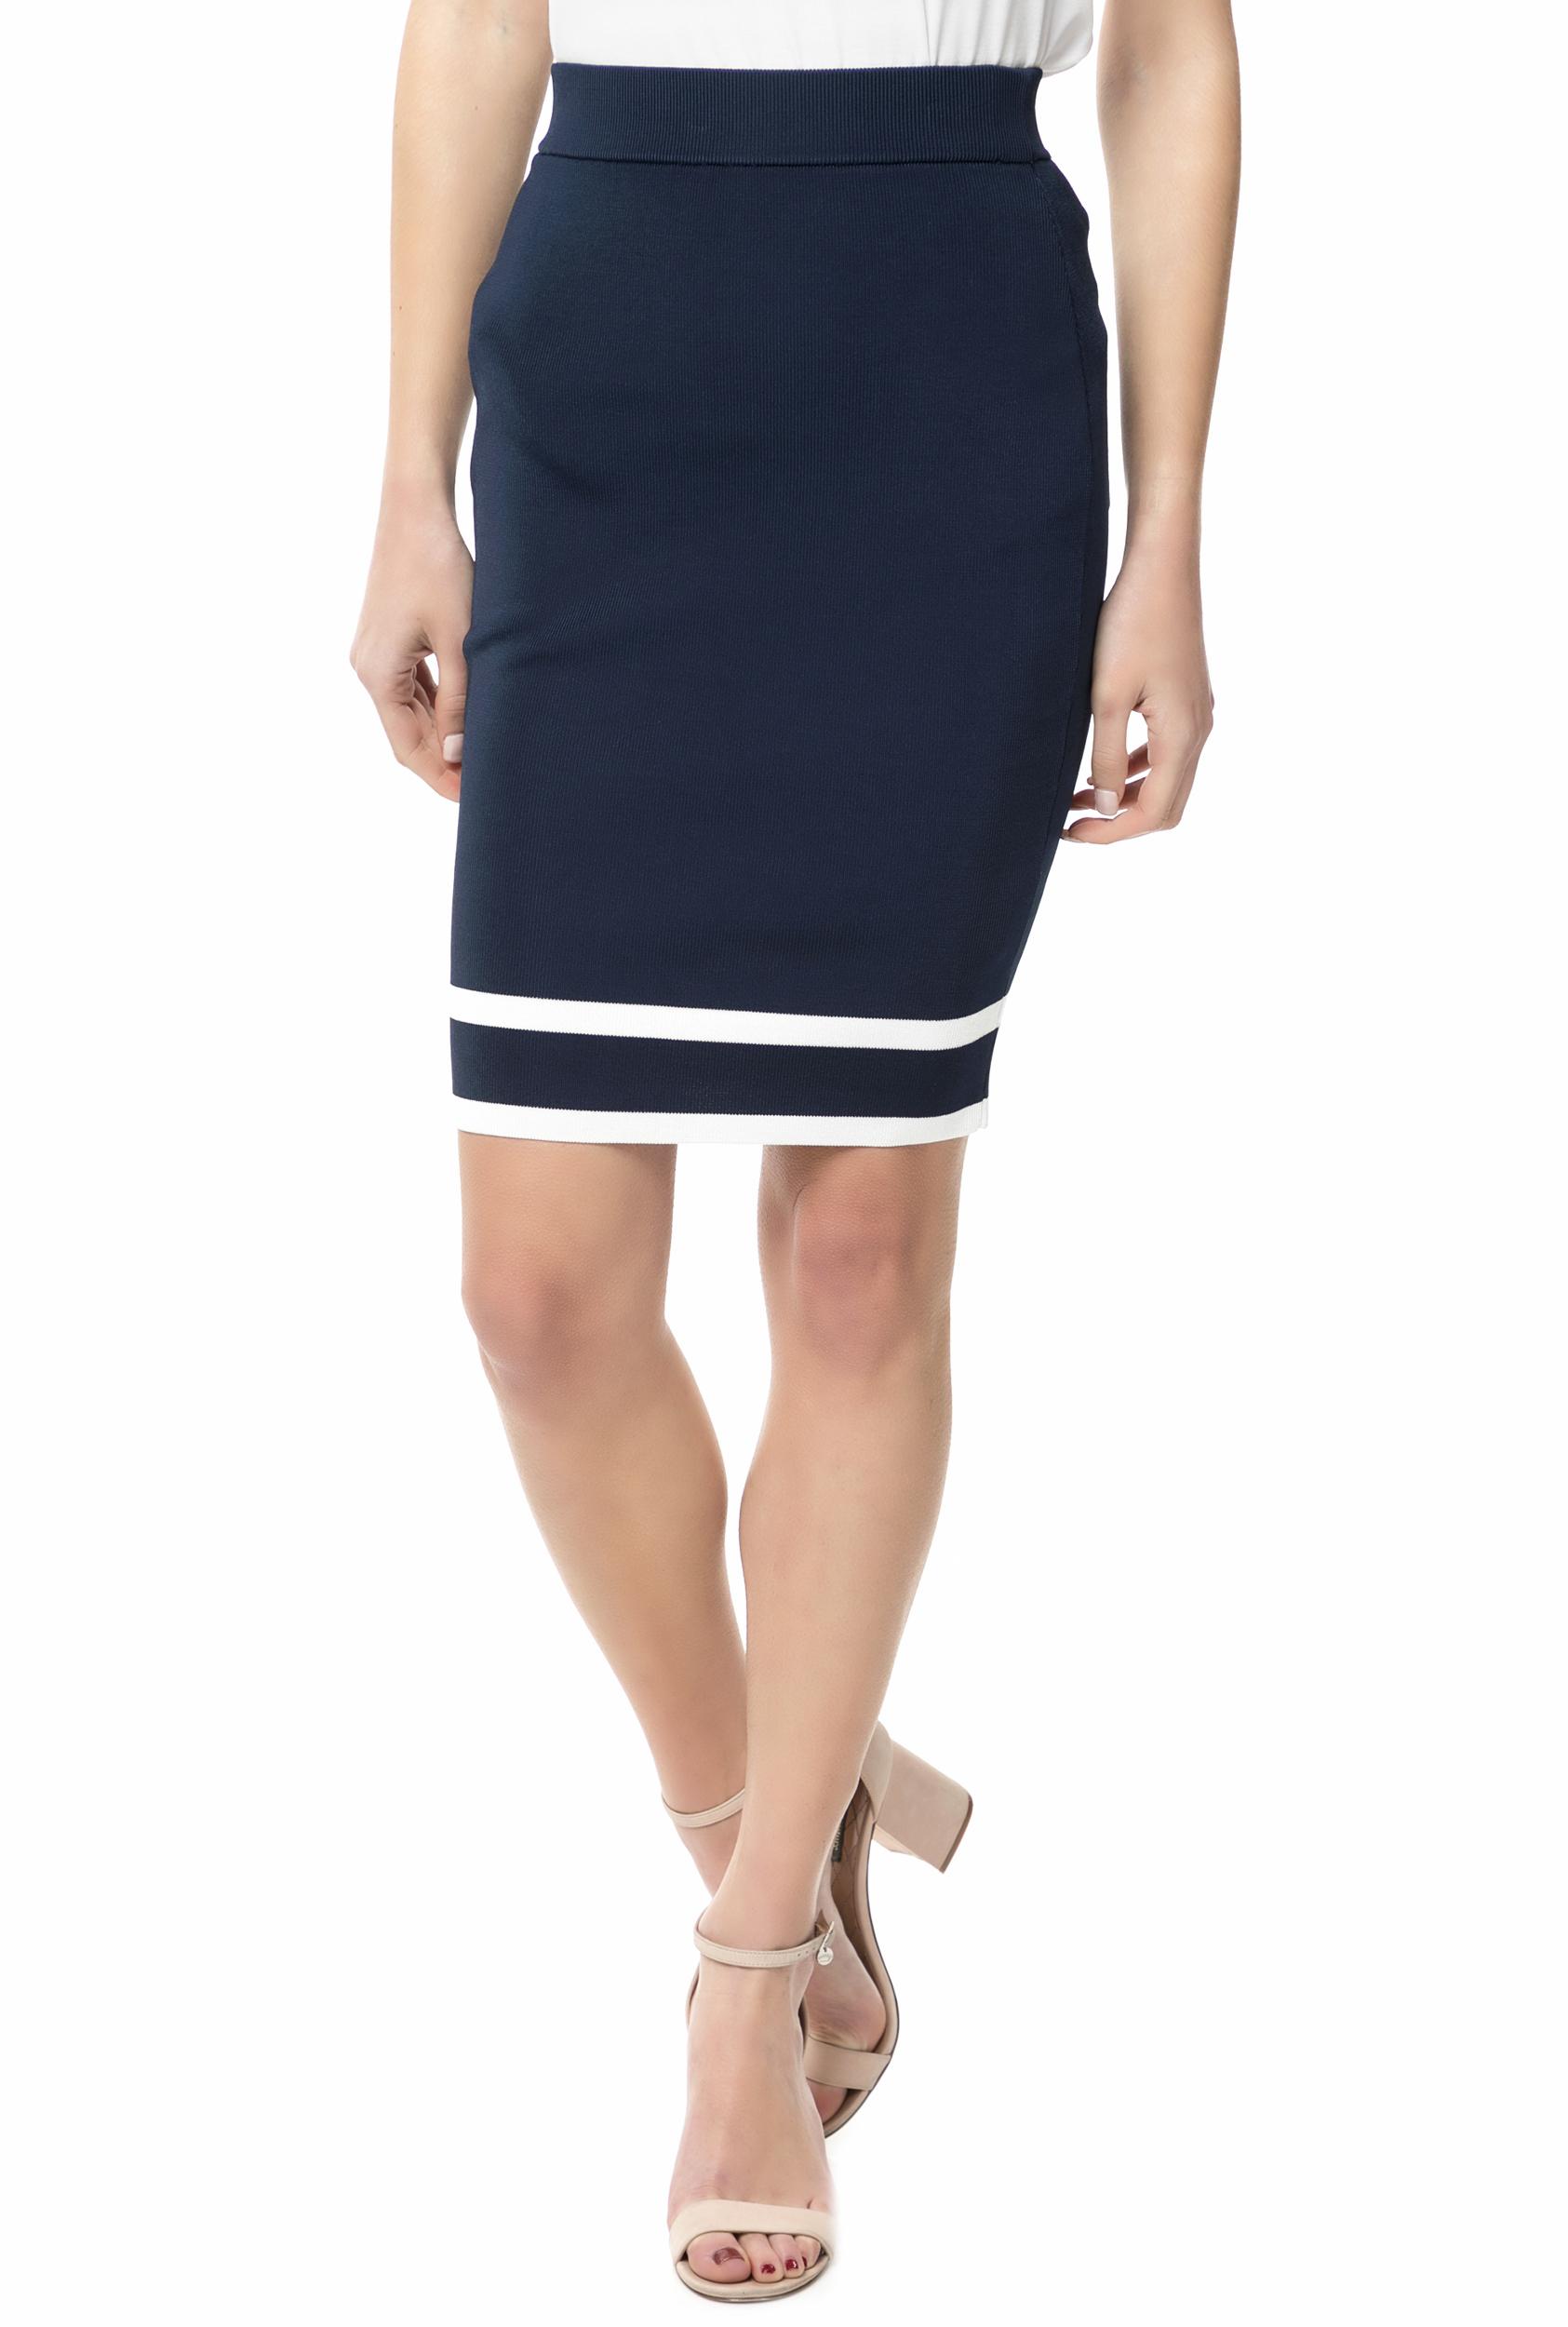 GUESS - Γυναικεία ψηλόμεση pencil φούστα JOLE GUESS μπλε - λευκή 64b7e3f9188